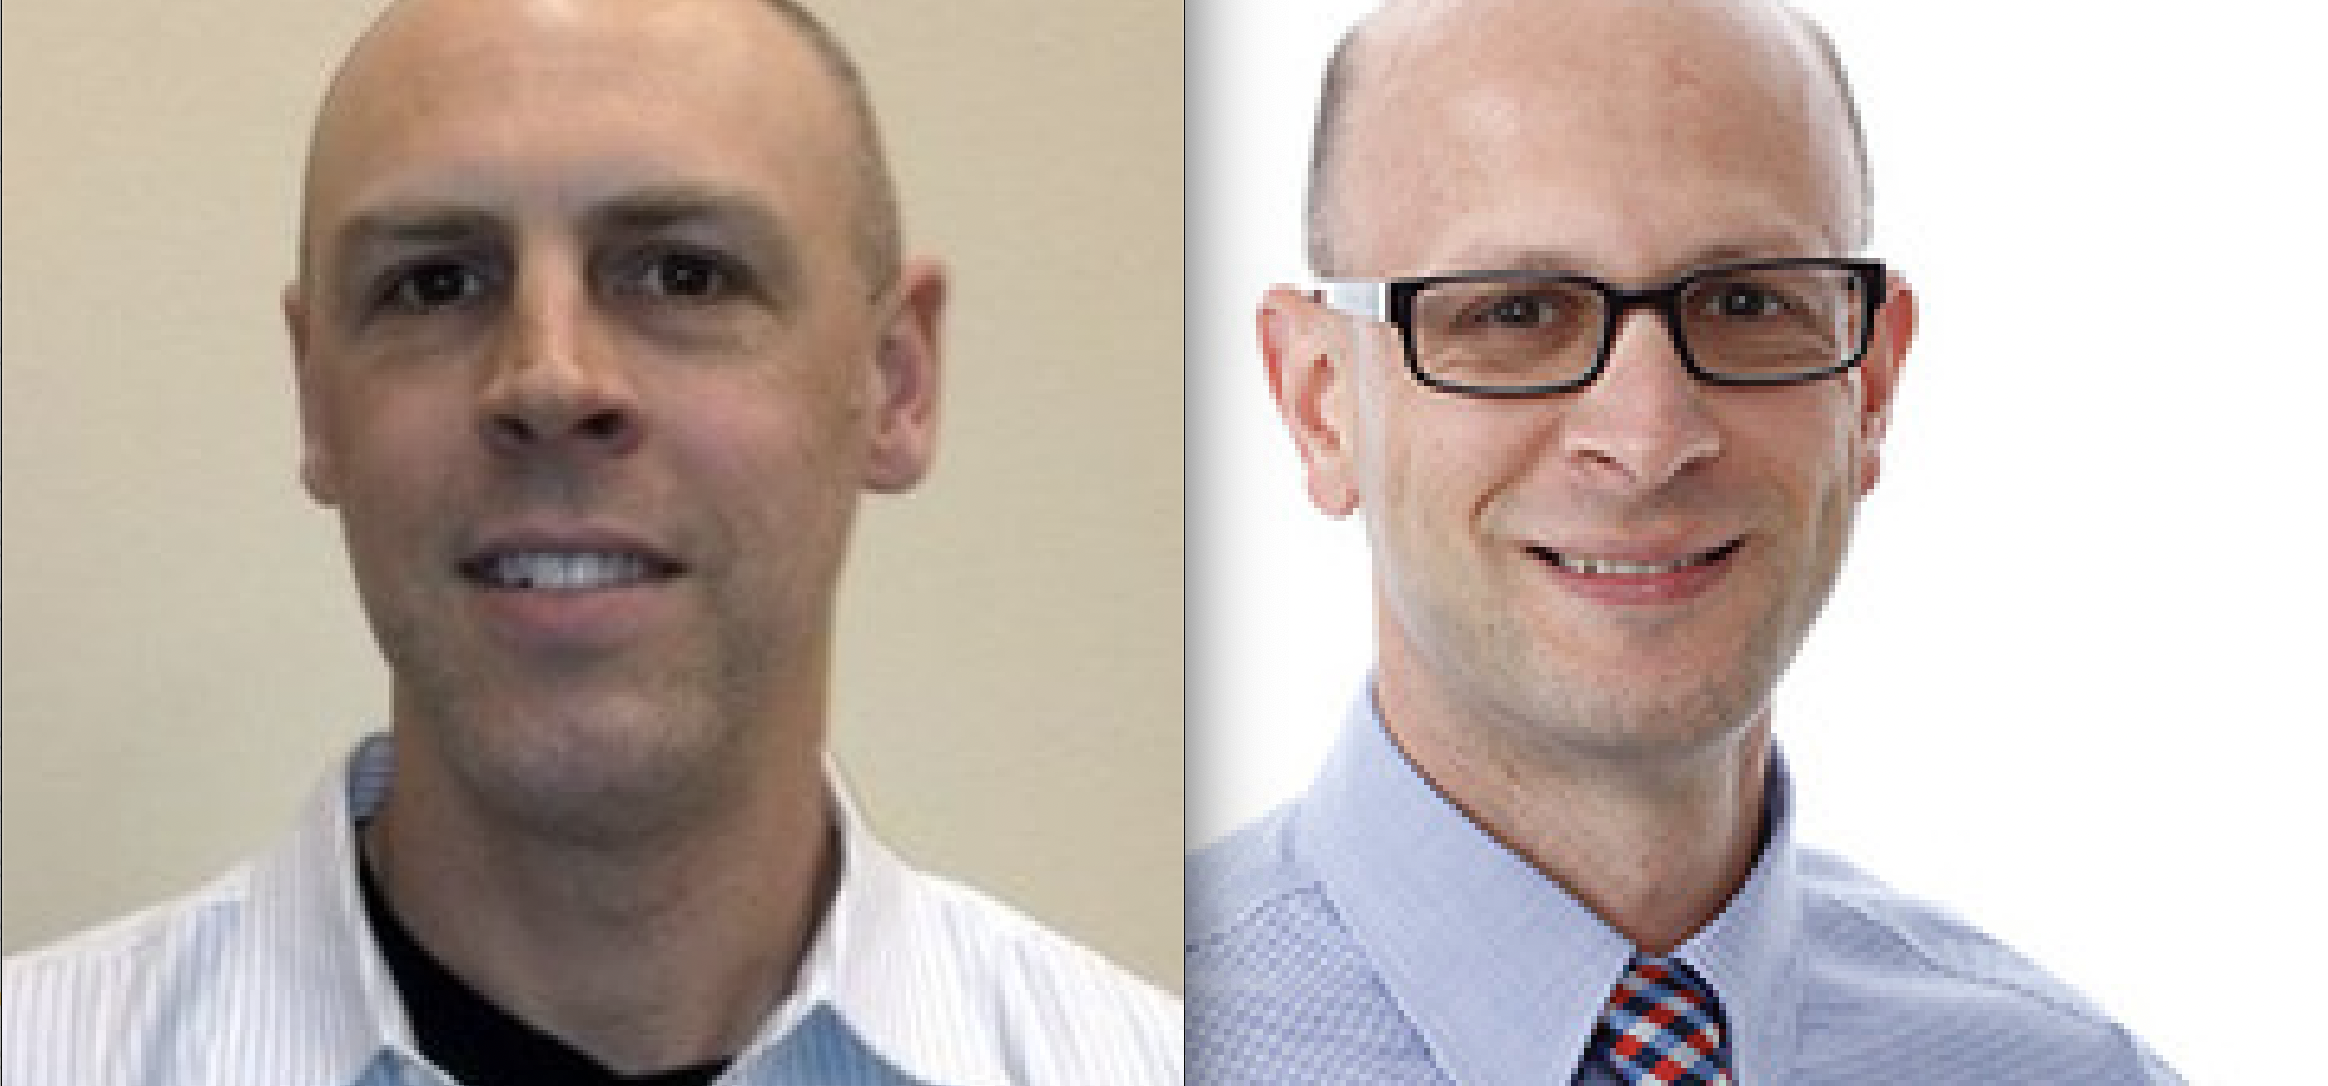 Chris Knoester, The Ohio State University and Richard J. Petts, Ball State University